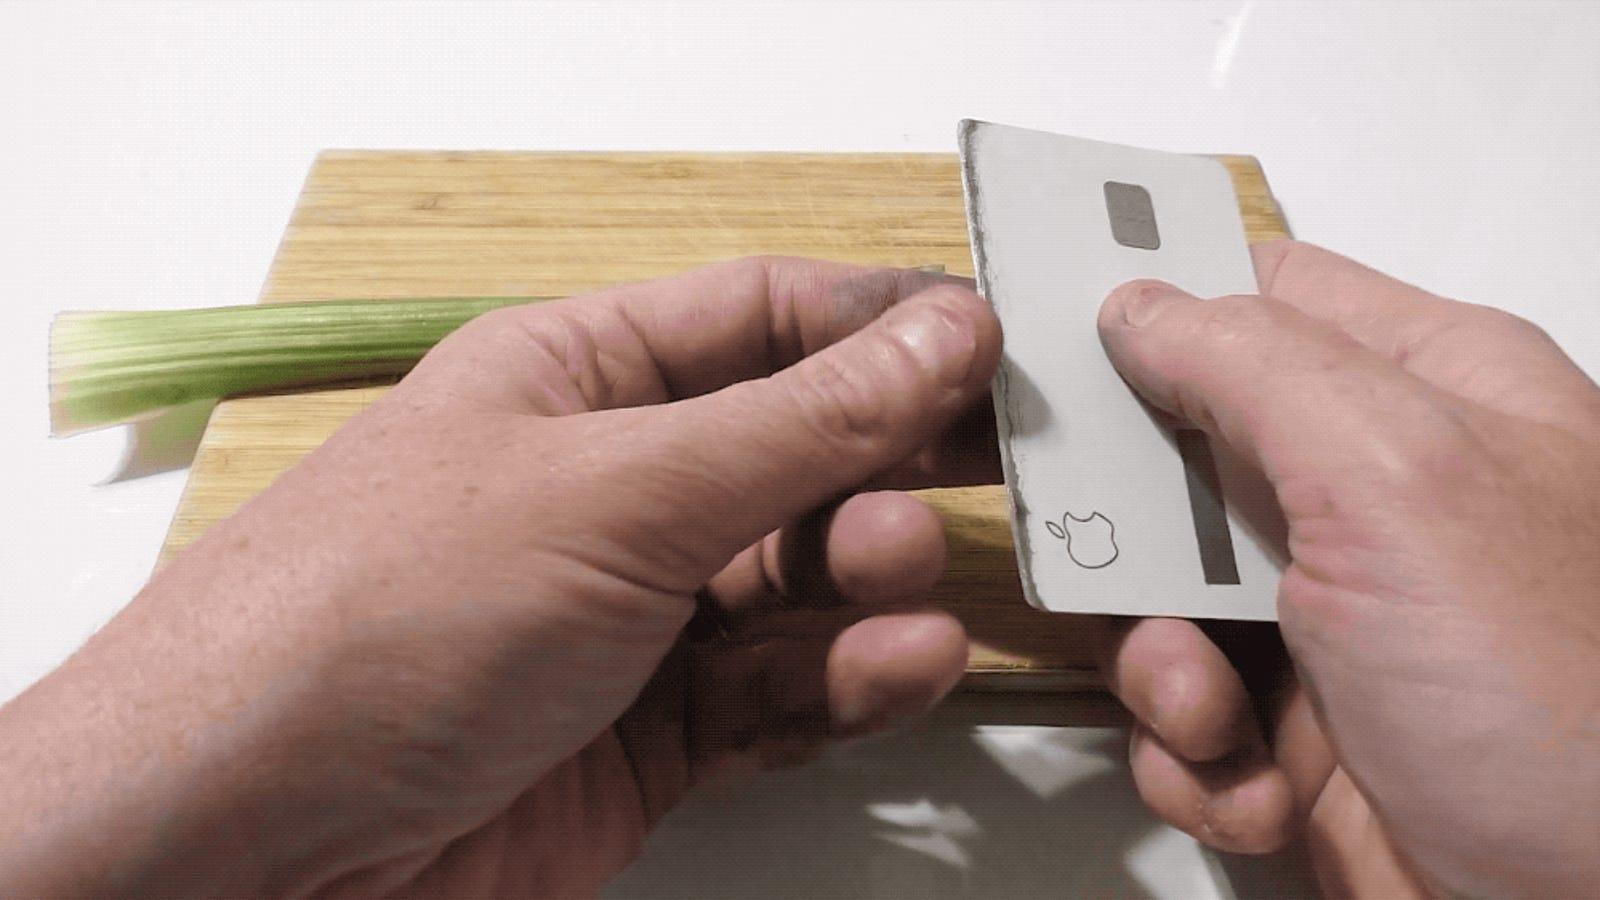 Convierten una Apple Card en un cuchillo filoso que pasa desapercibido